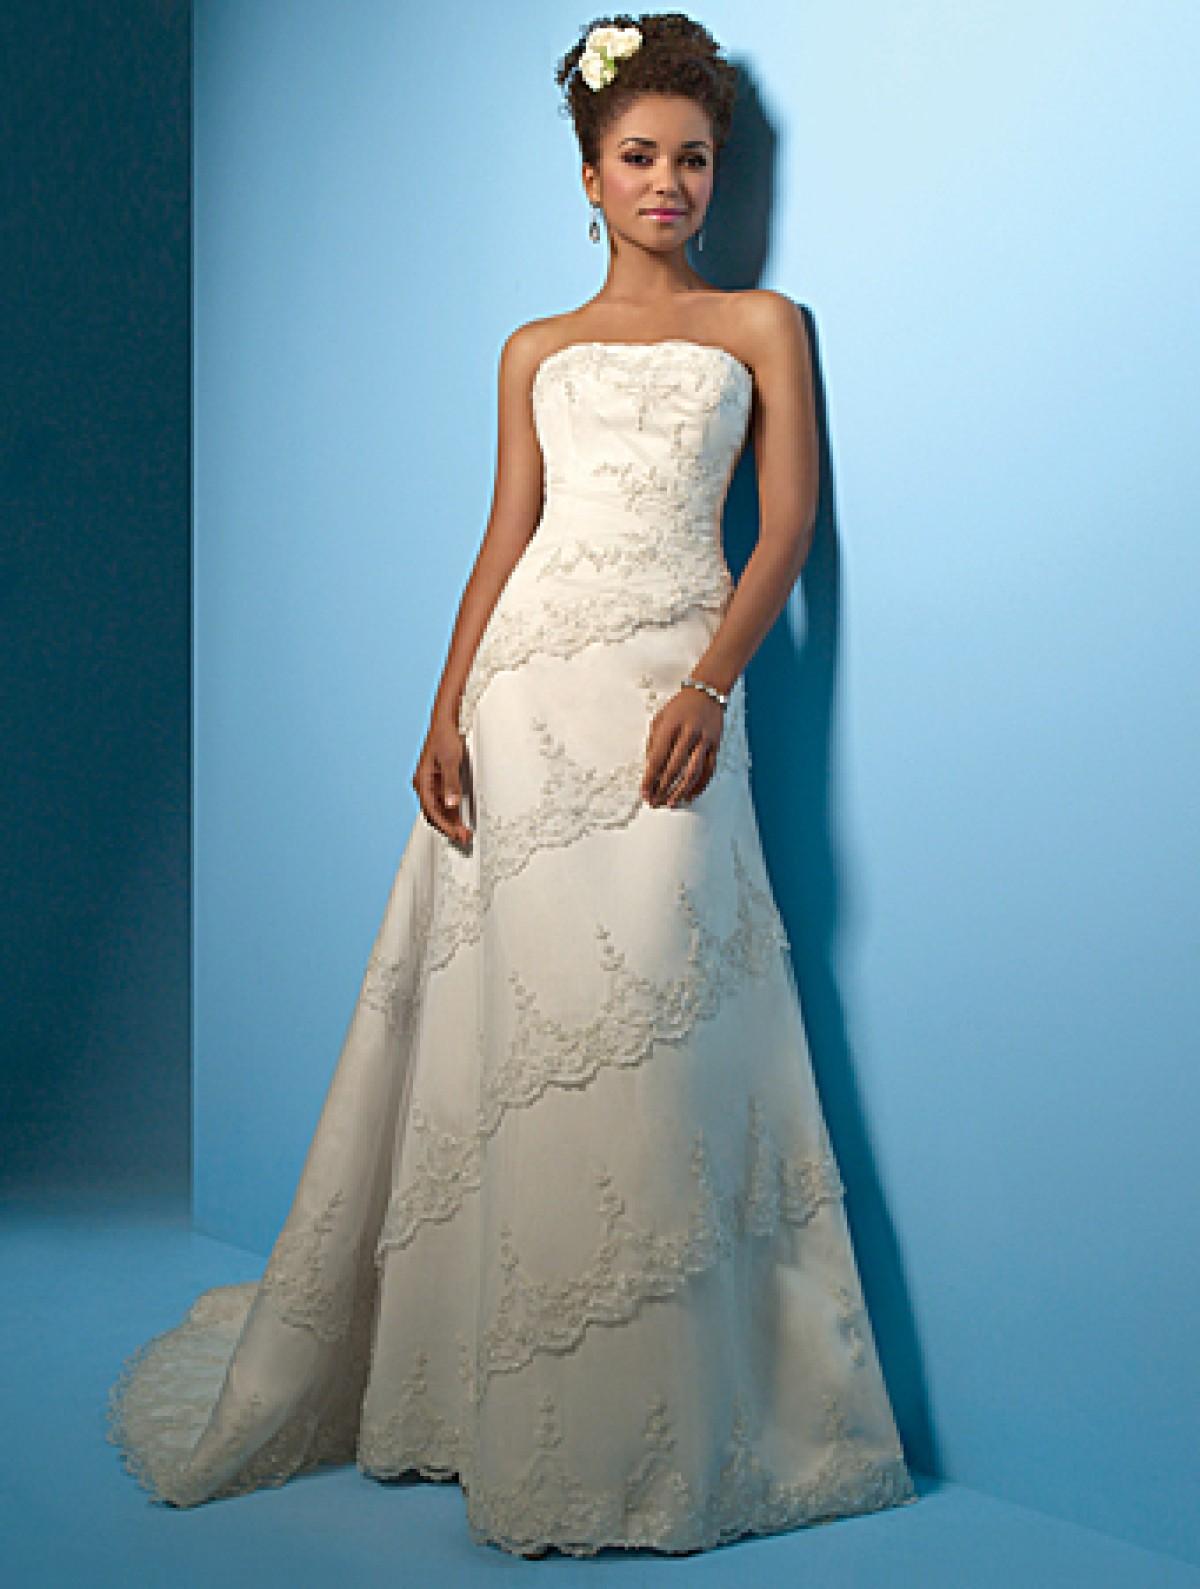 Bridal Gowns | Bargain Bridal Gown